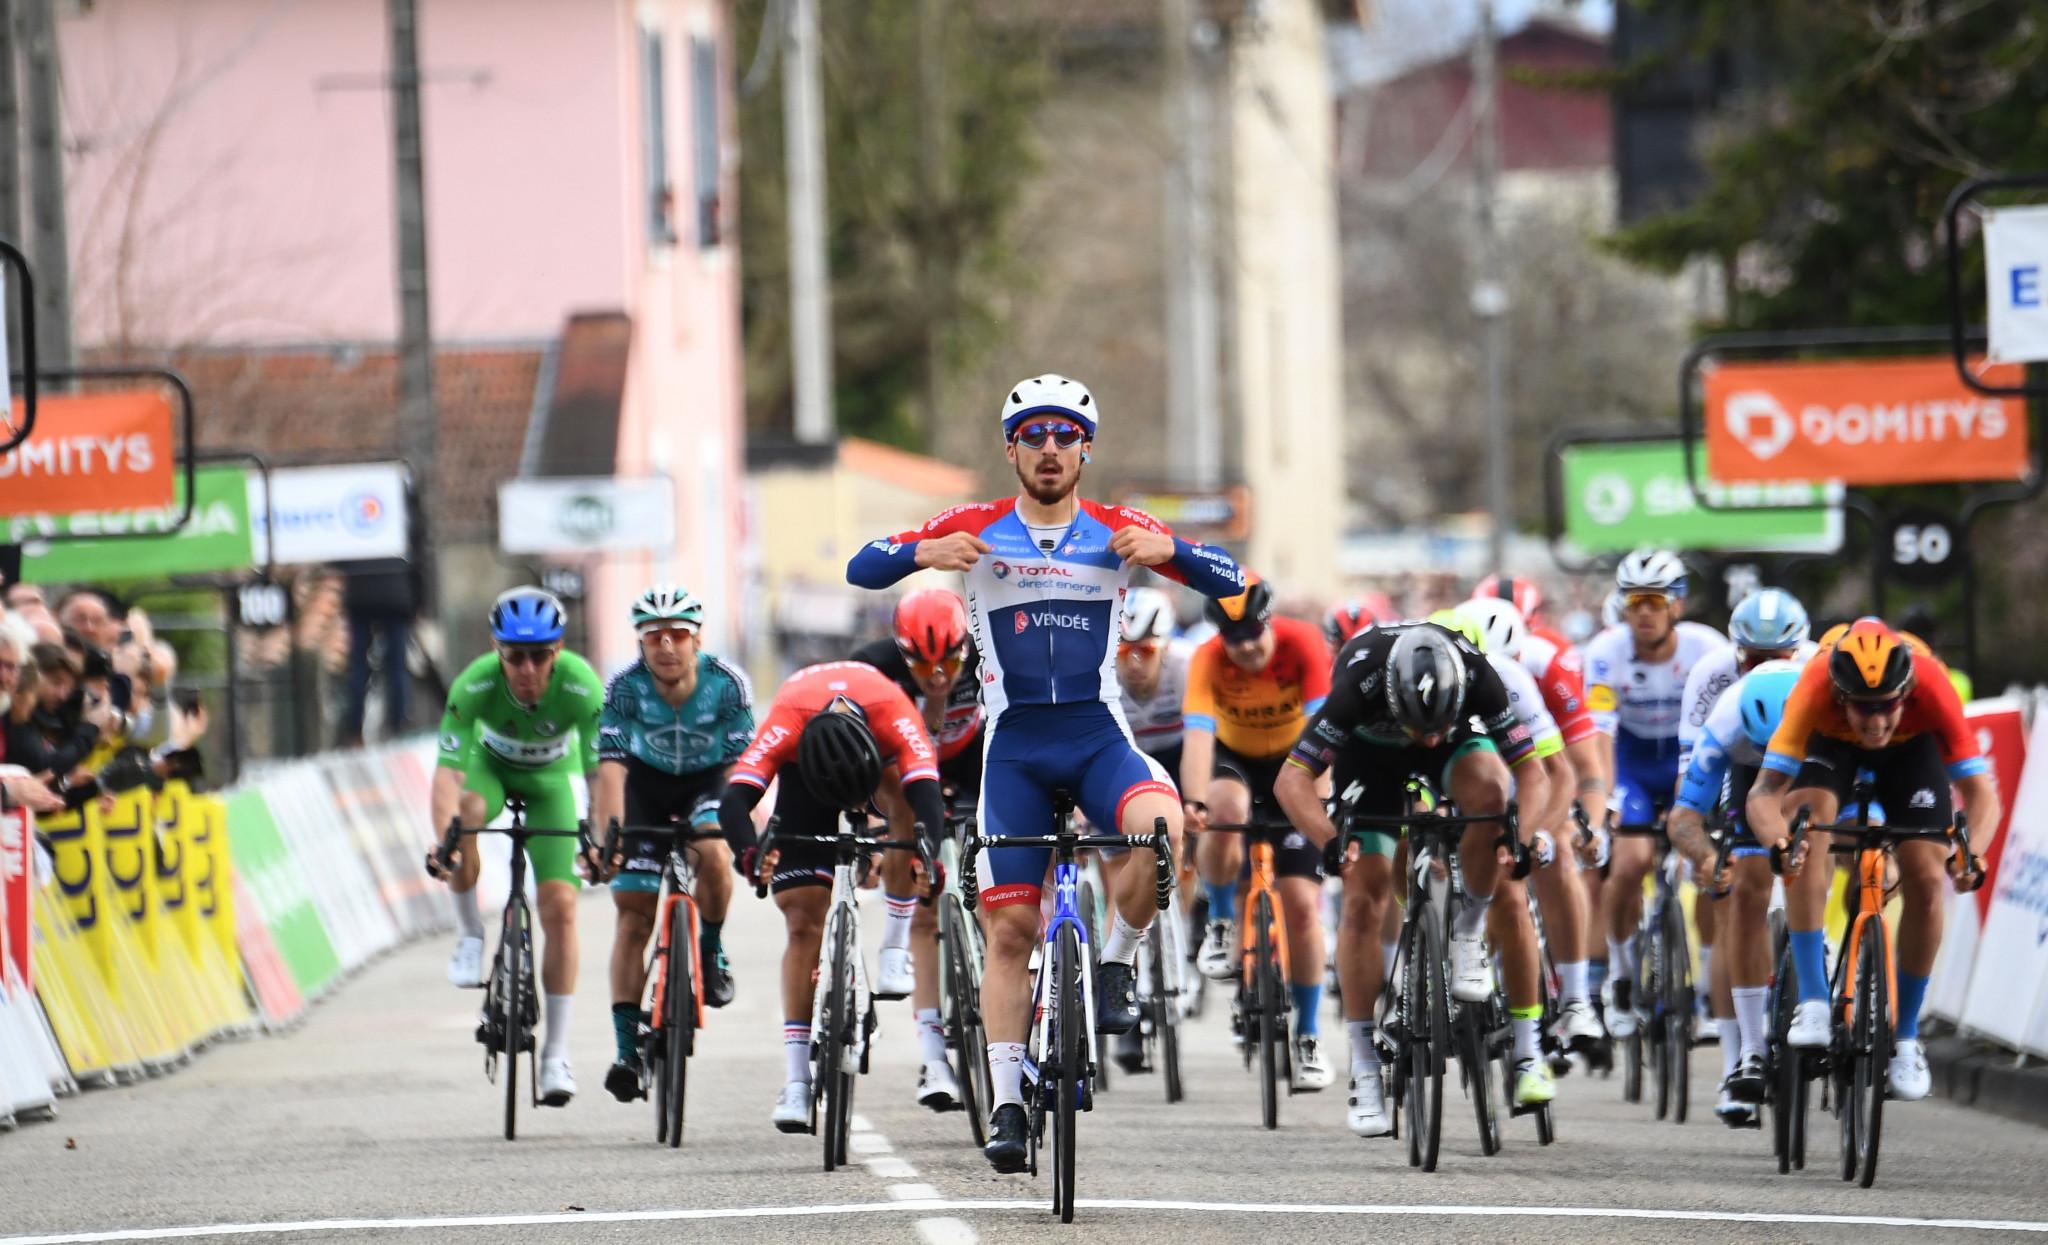 Bonifazio earns stage five win at Paris-Nice as Tratnik falls just short